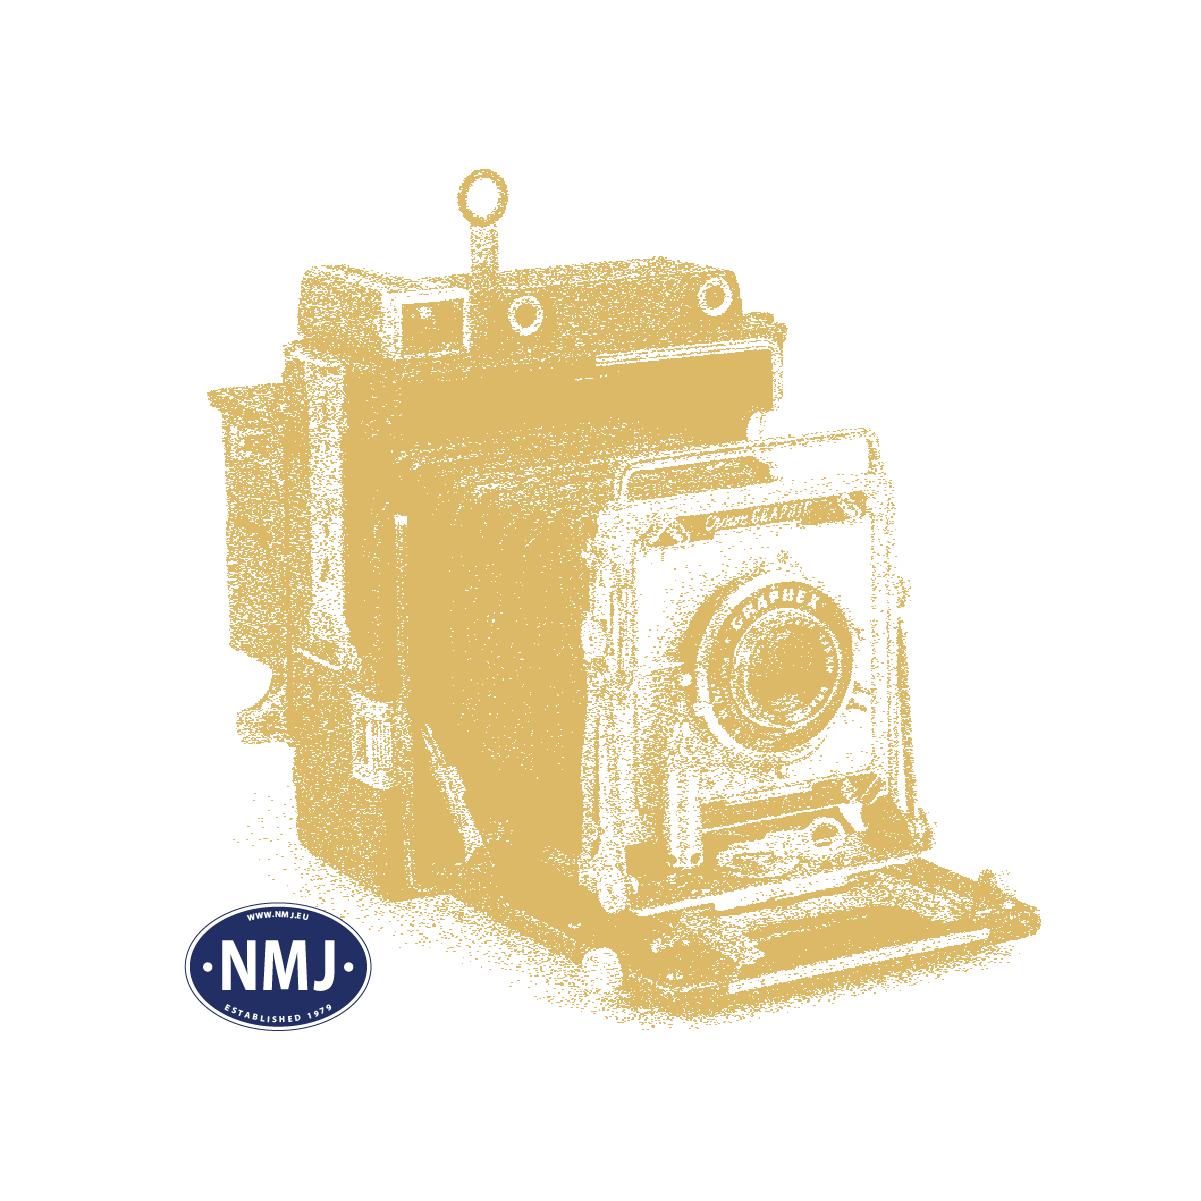 NMJT95402 - NMJ Topline SNCB 202003, AC Digital